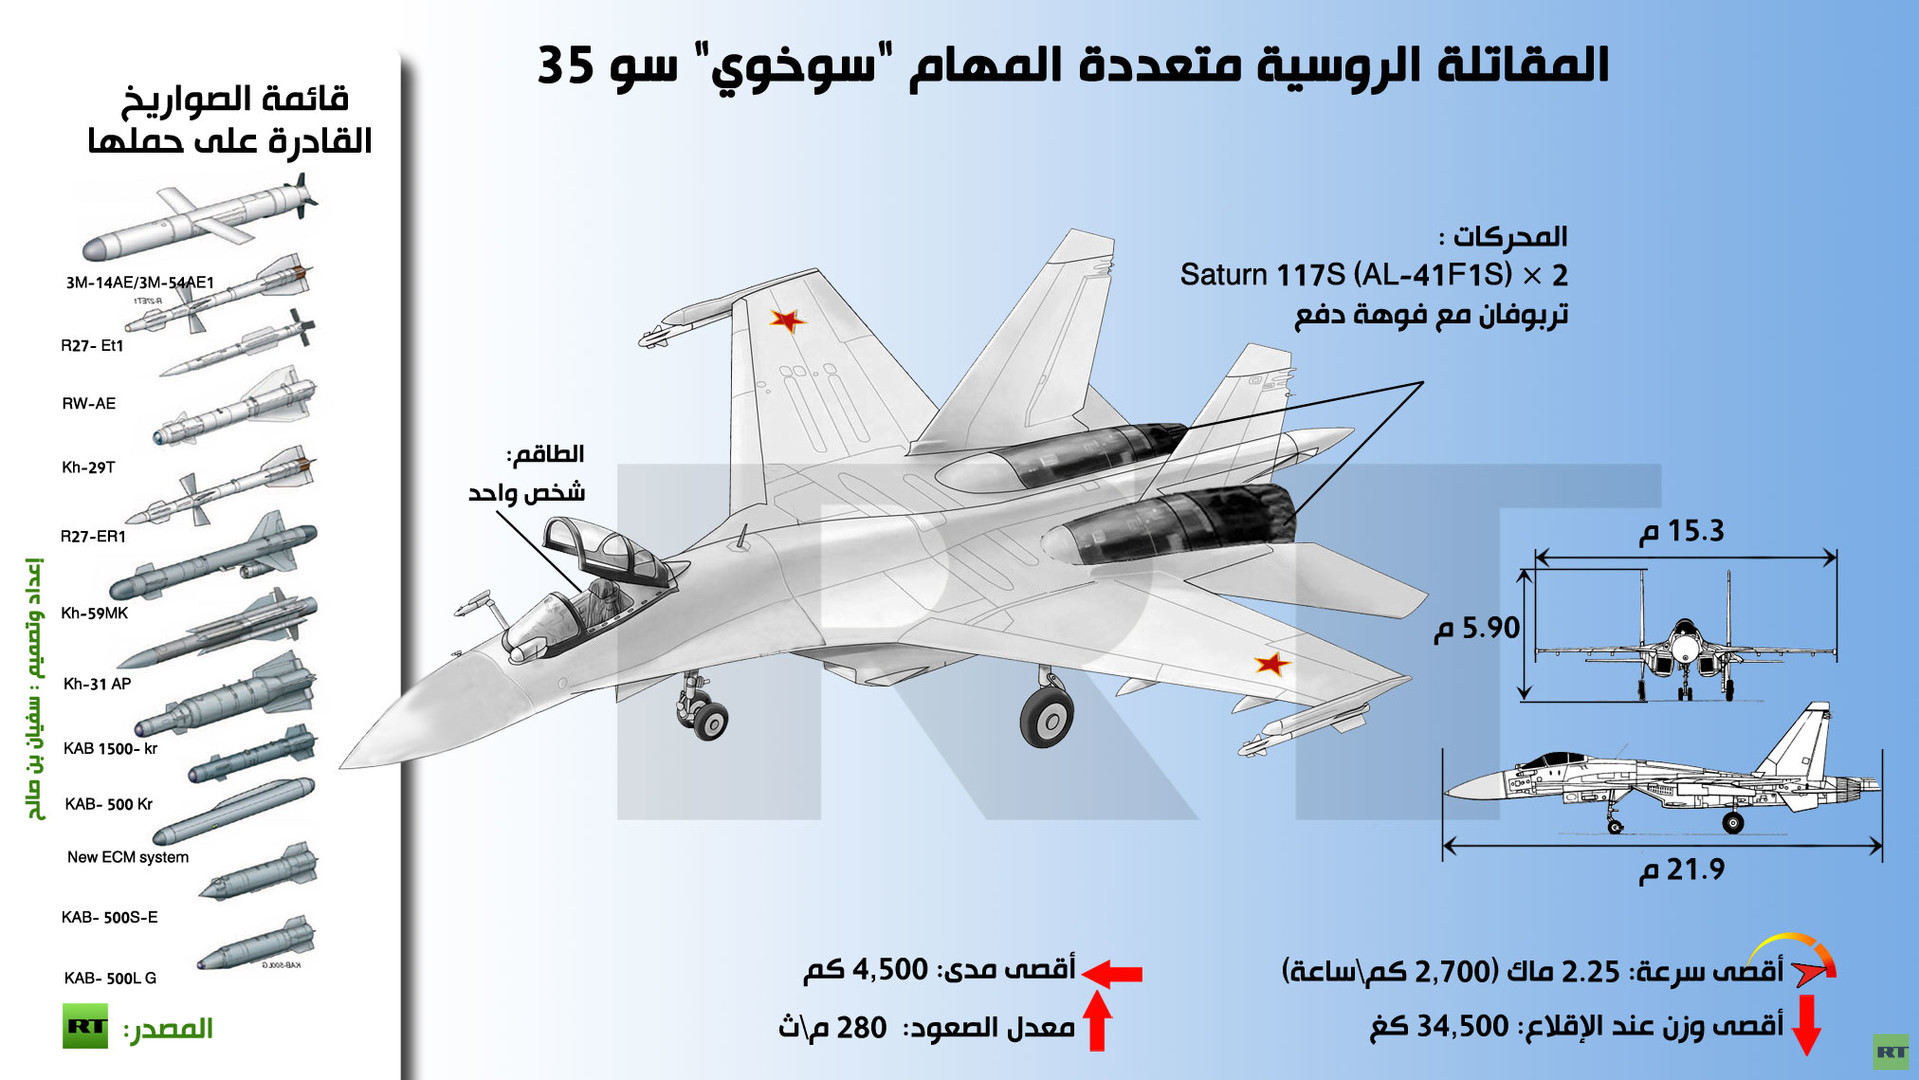 Sukhoi Su-35 - صفحة 2 572497d9c46188be508b4590